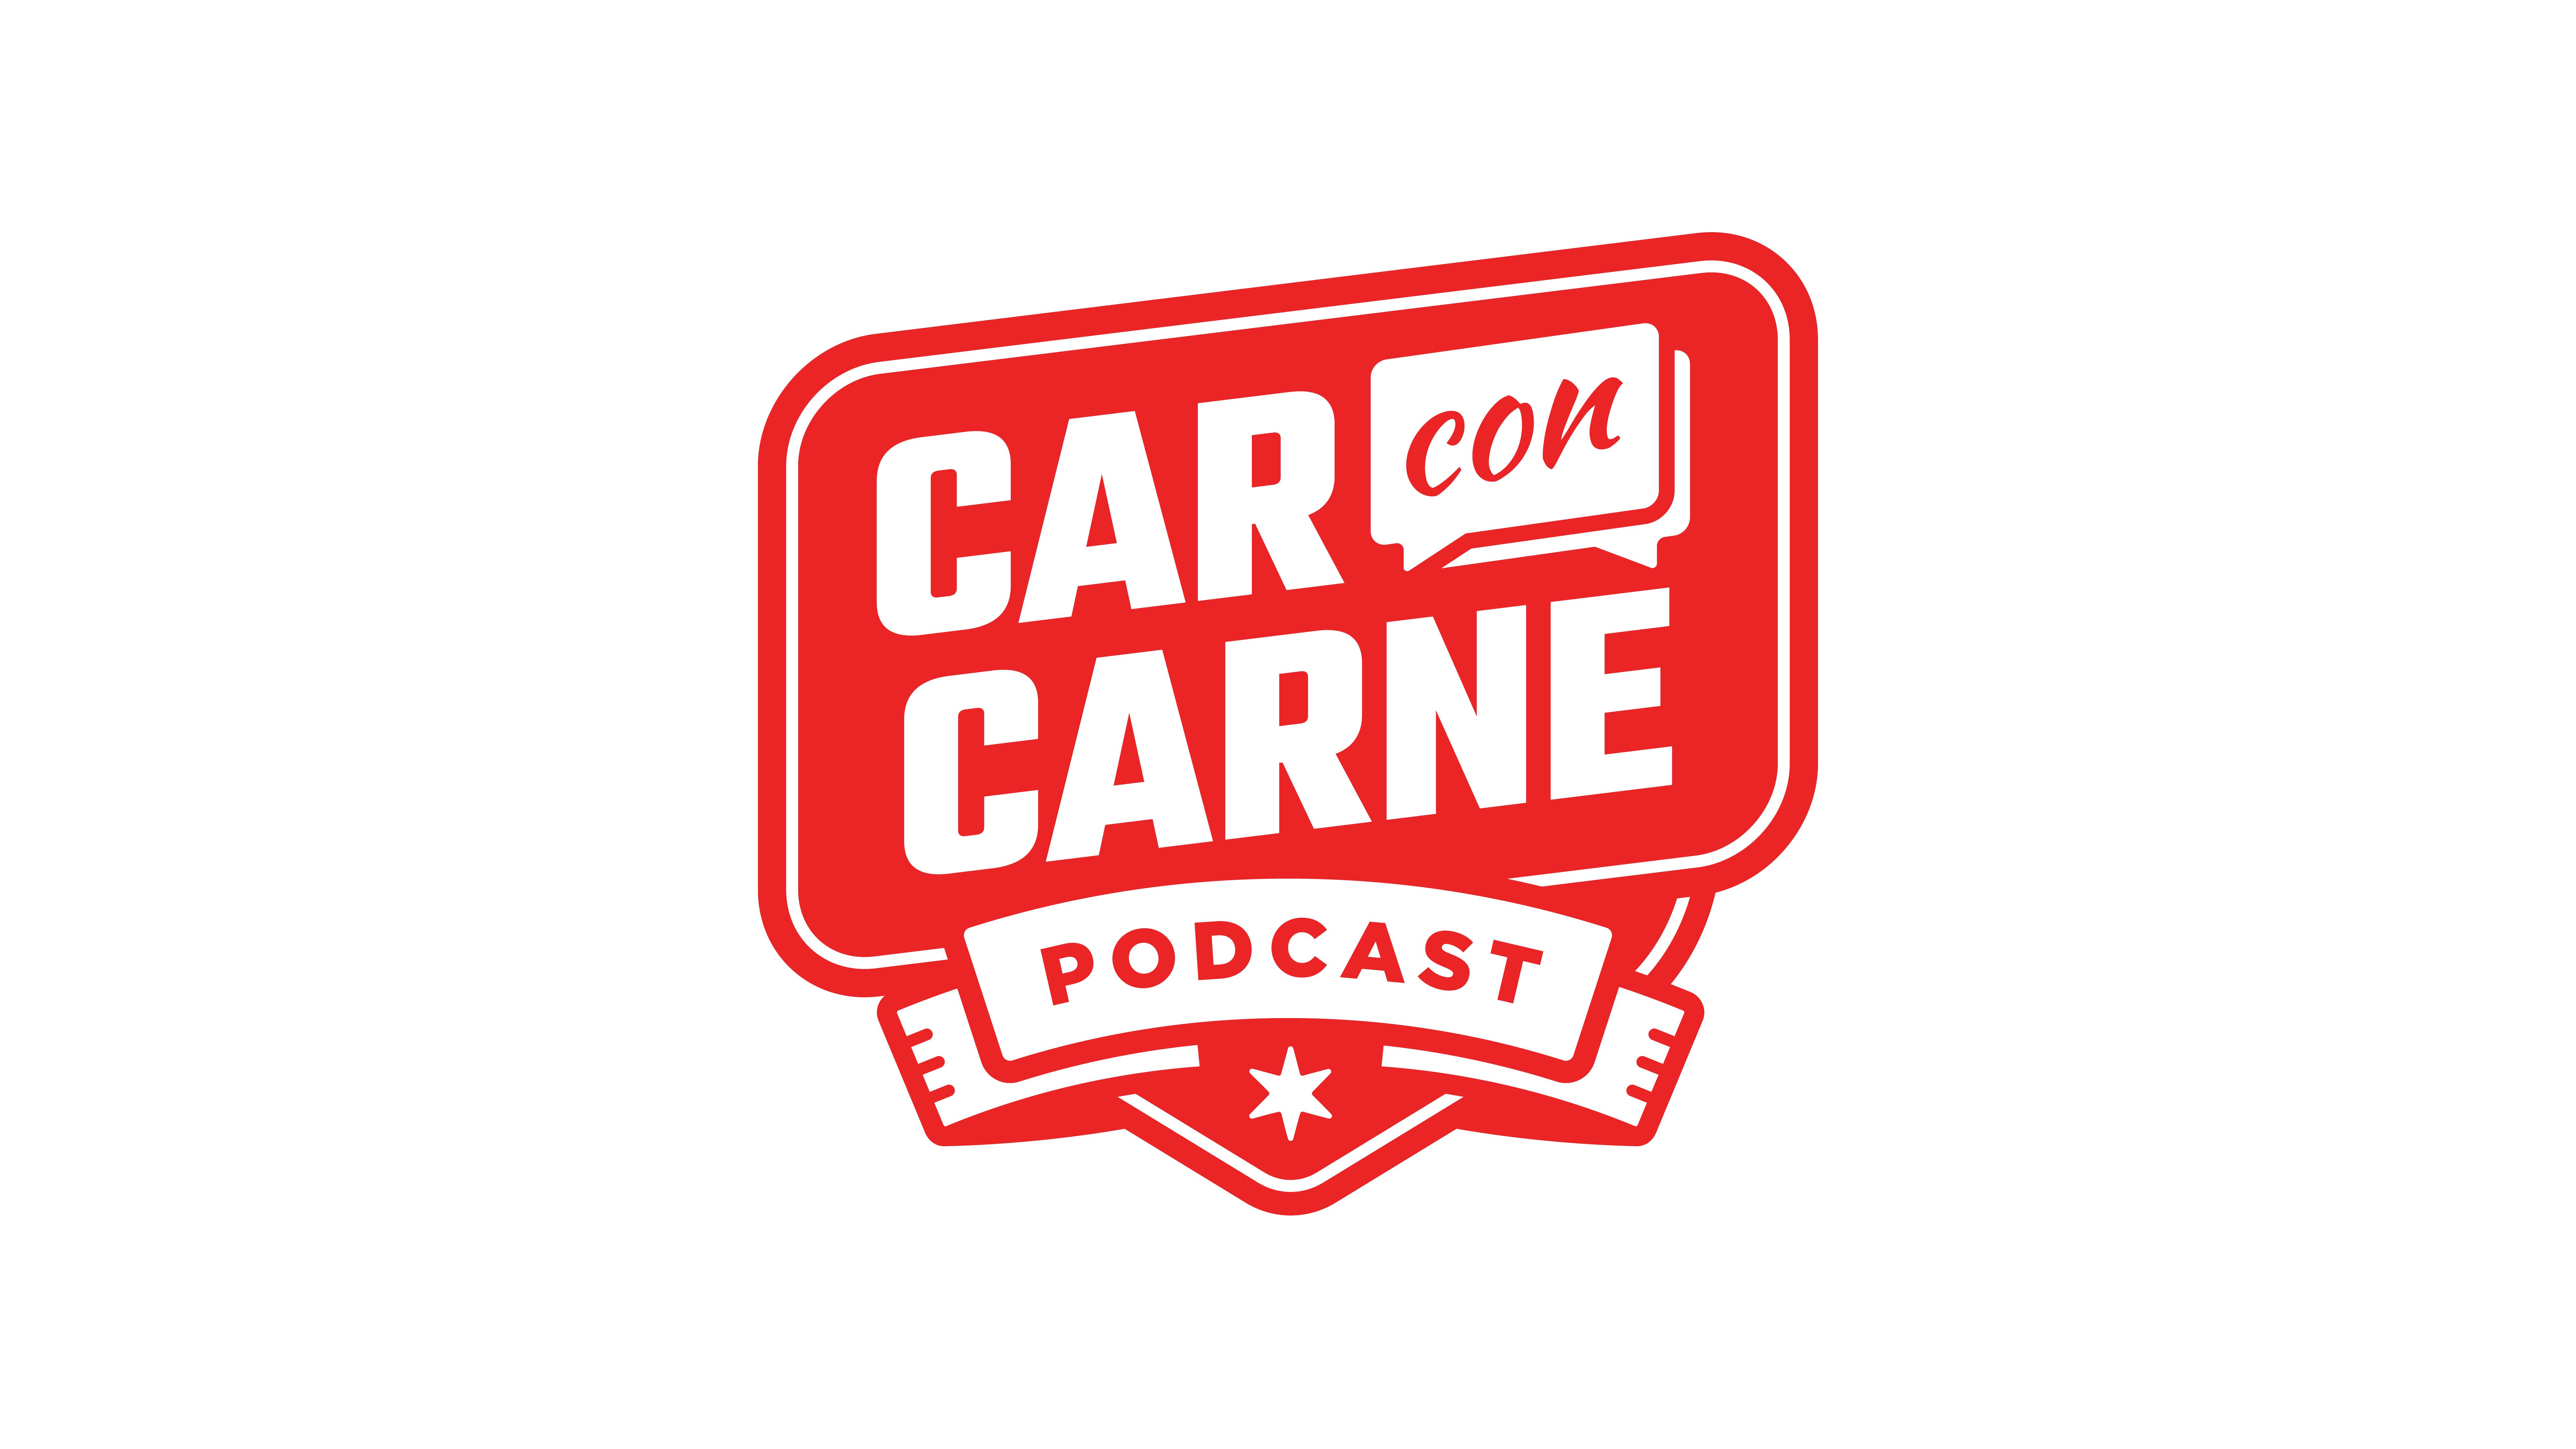 CarConCarne-Logo_RGB.png